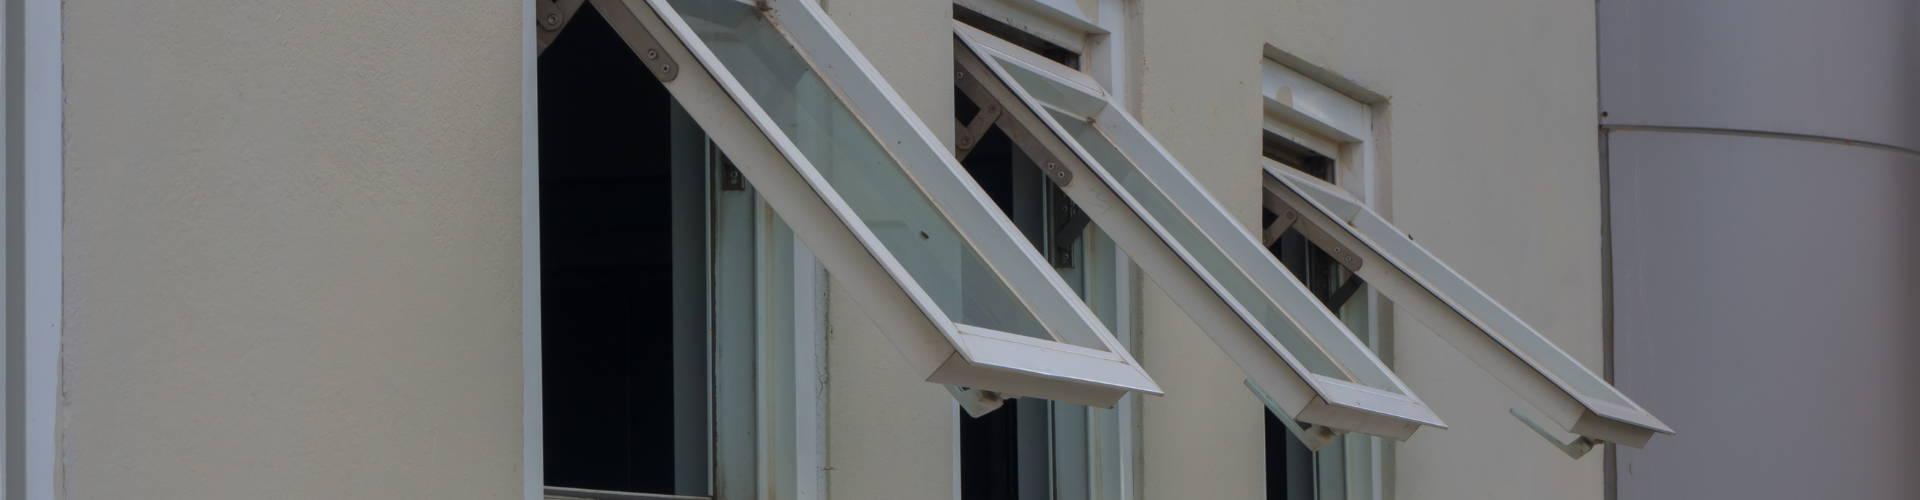 home ventilation open window